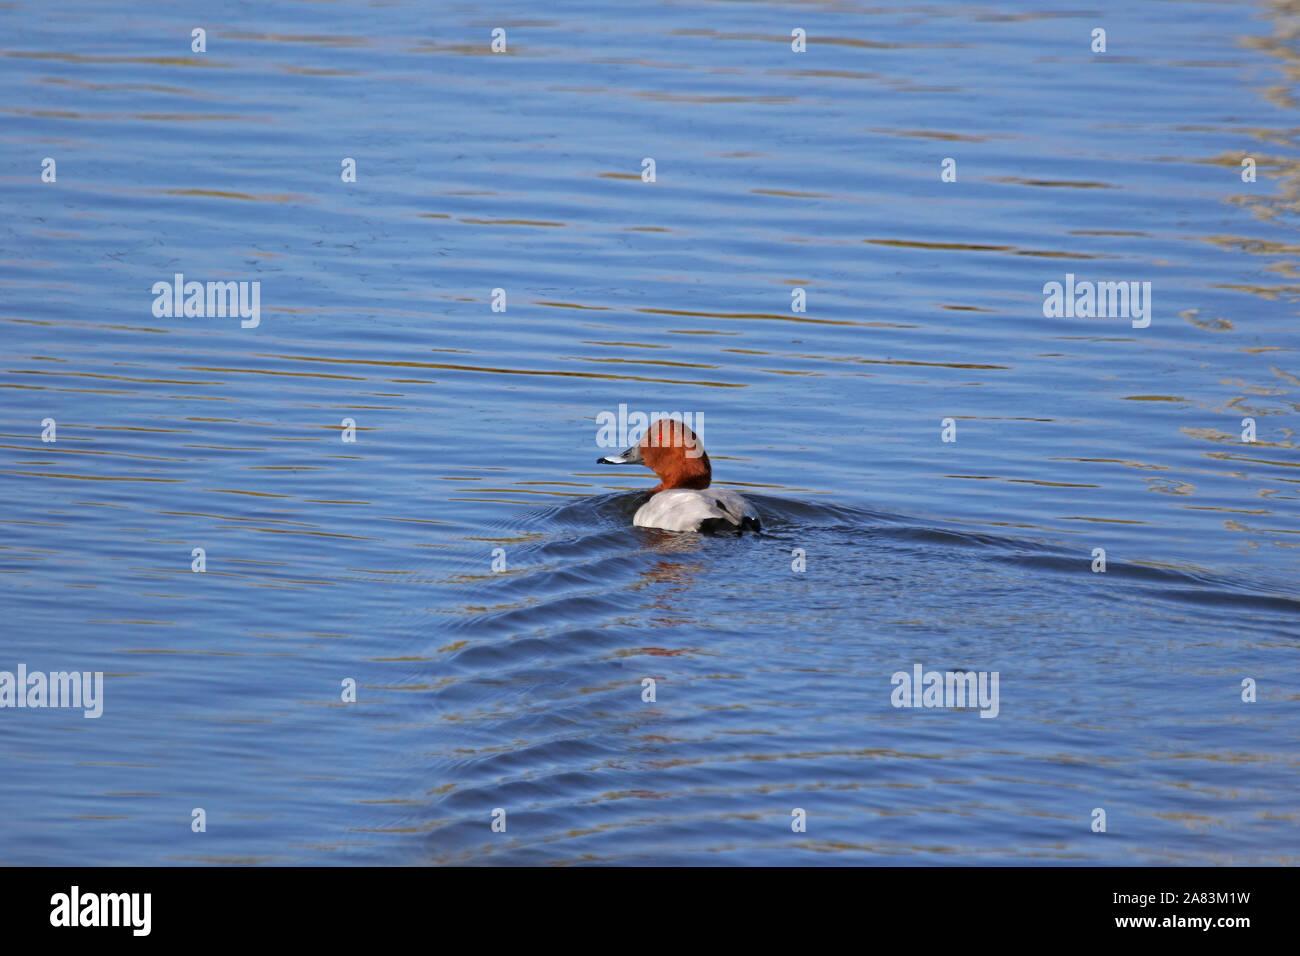 male common pochard close up Latin aythya ferina swimming in a nature reserve in Porto Potenza Picena in Italy Stock Photo